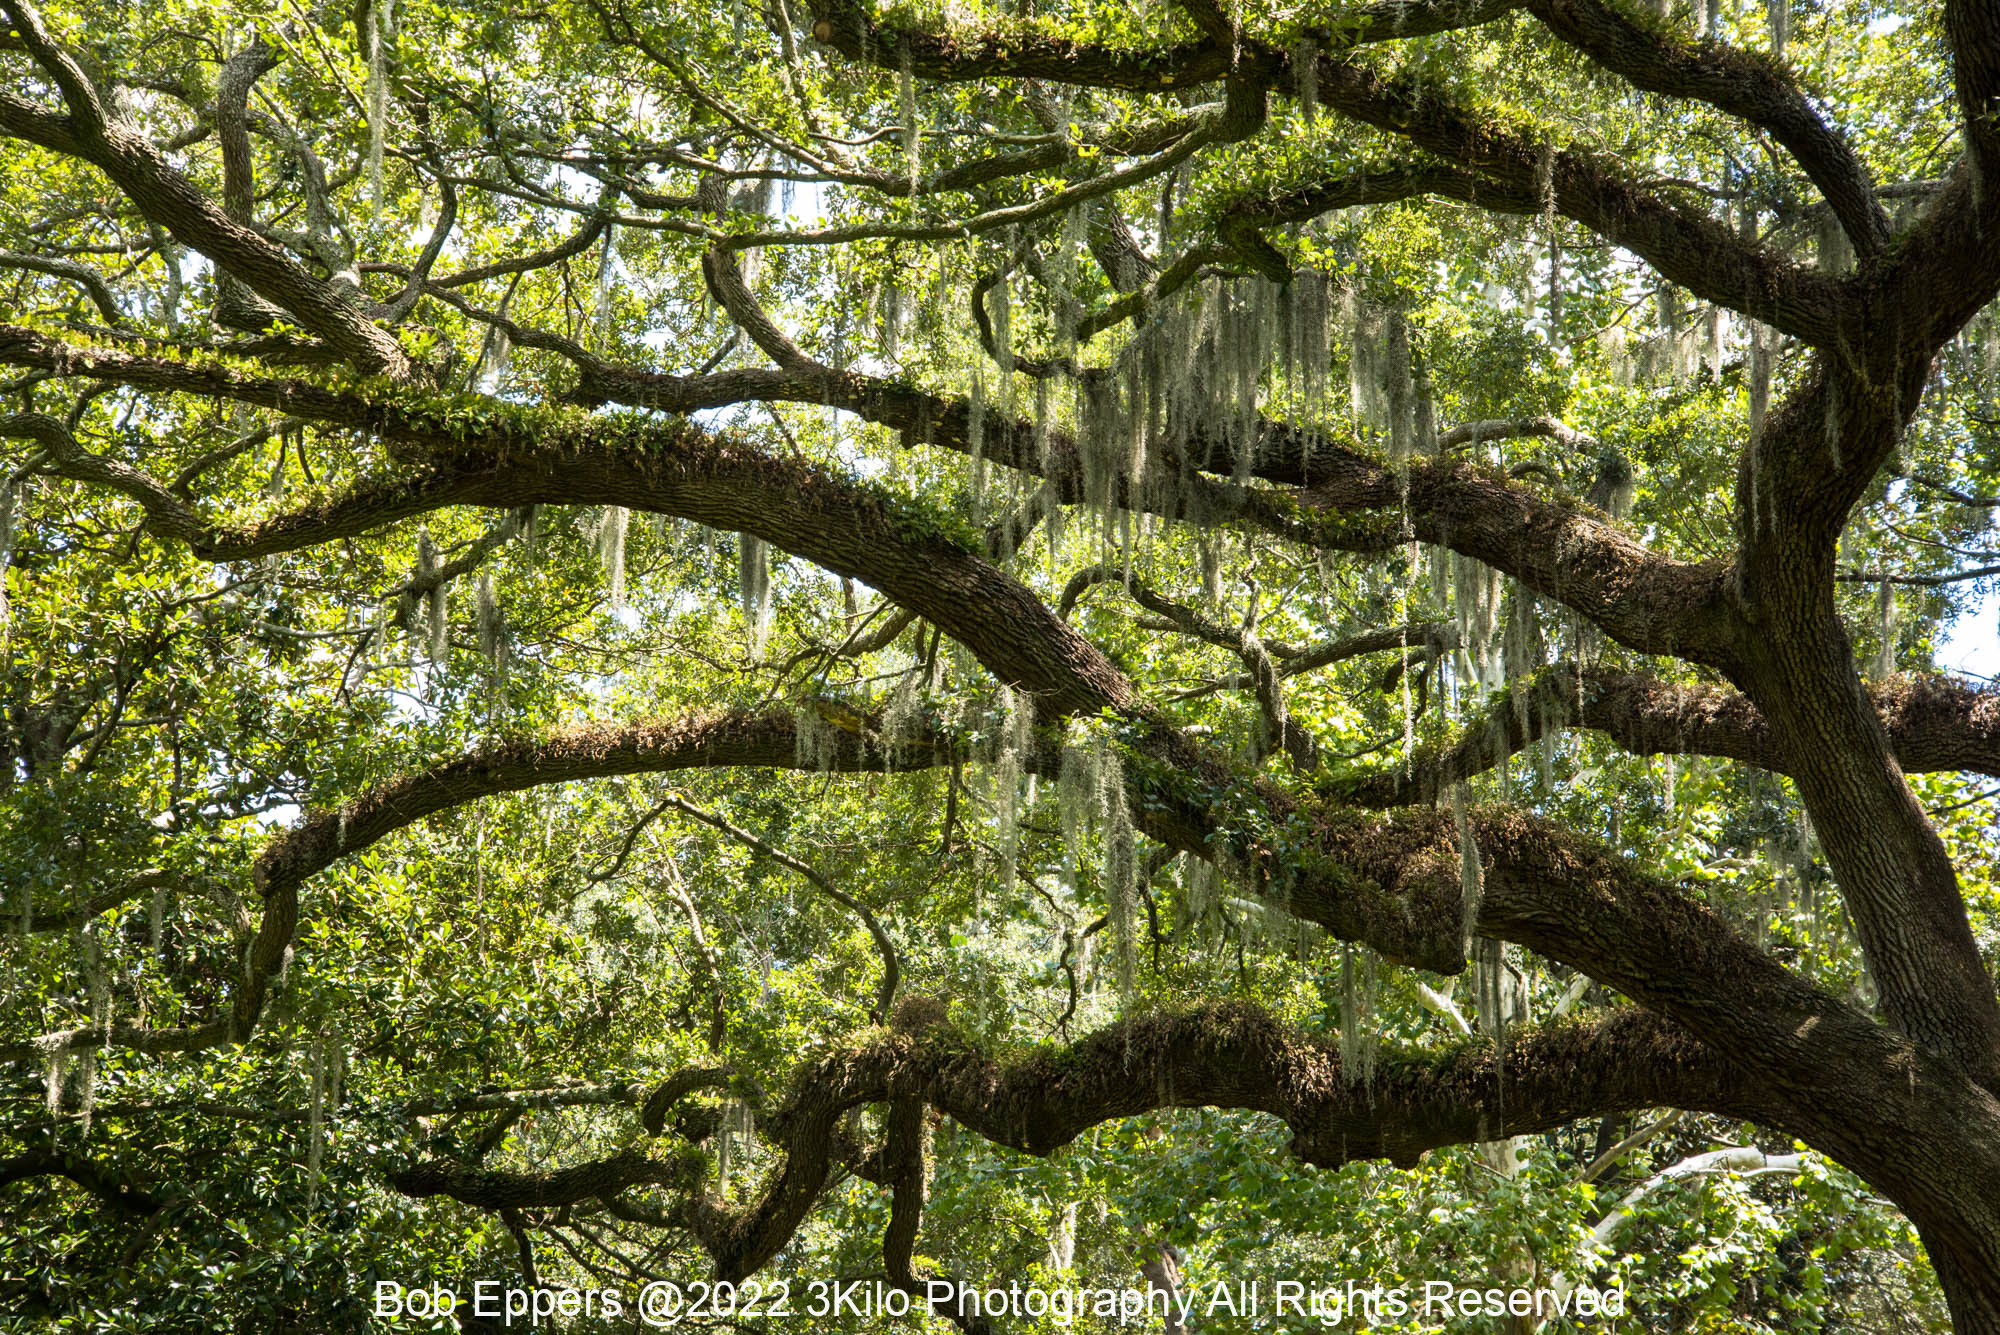 Photo of Oaks with Spanish Moss in Savannah GA